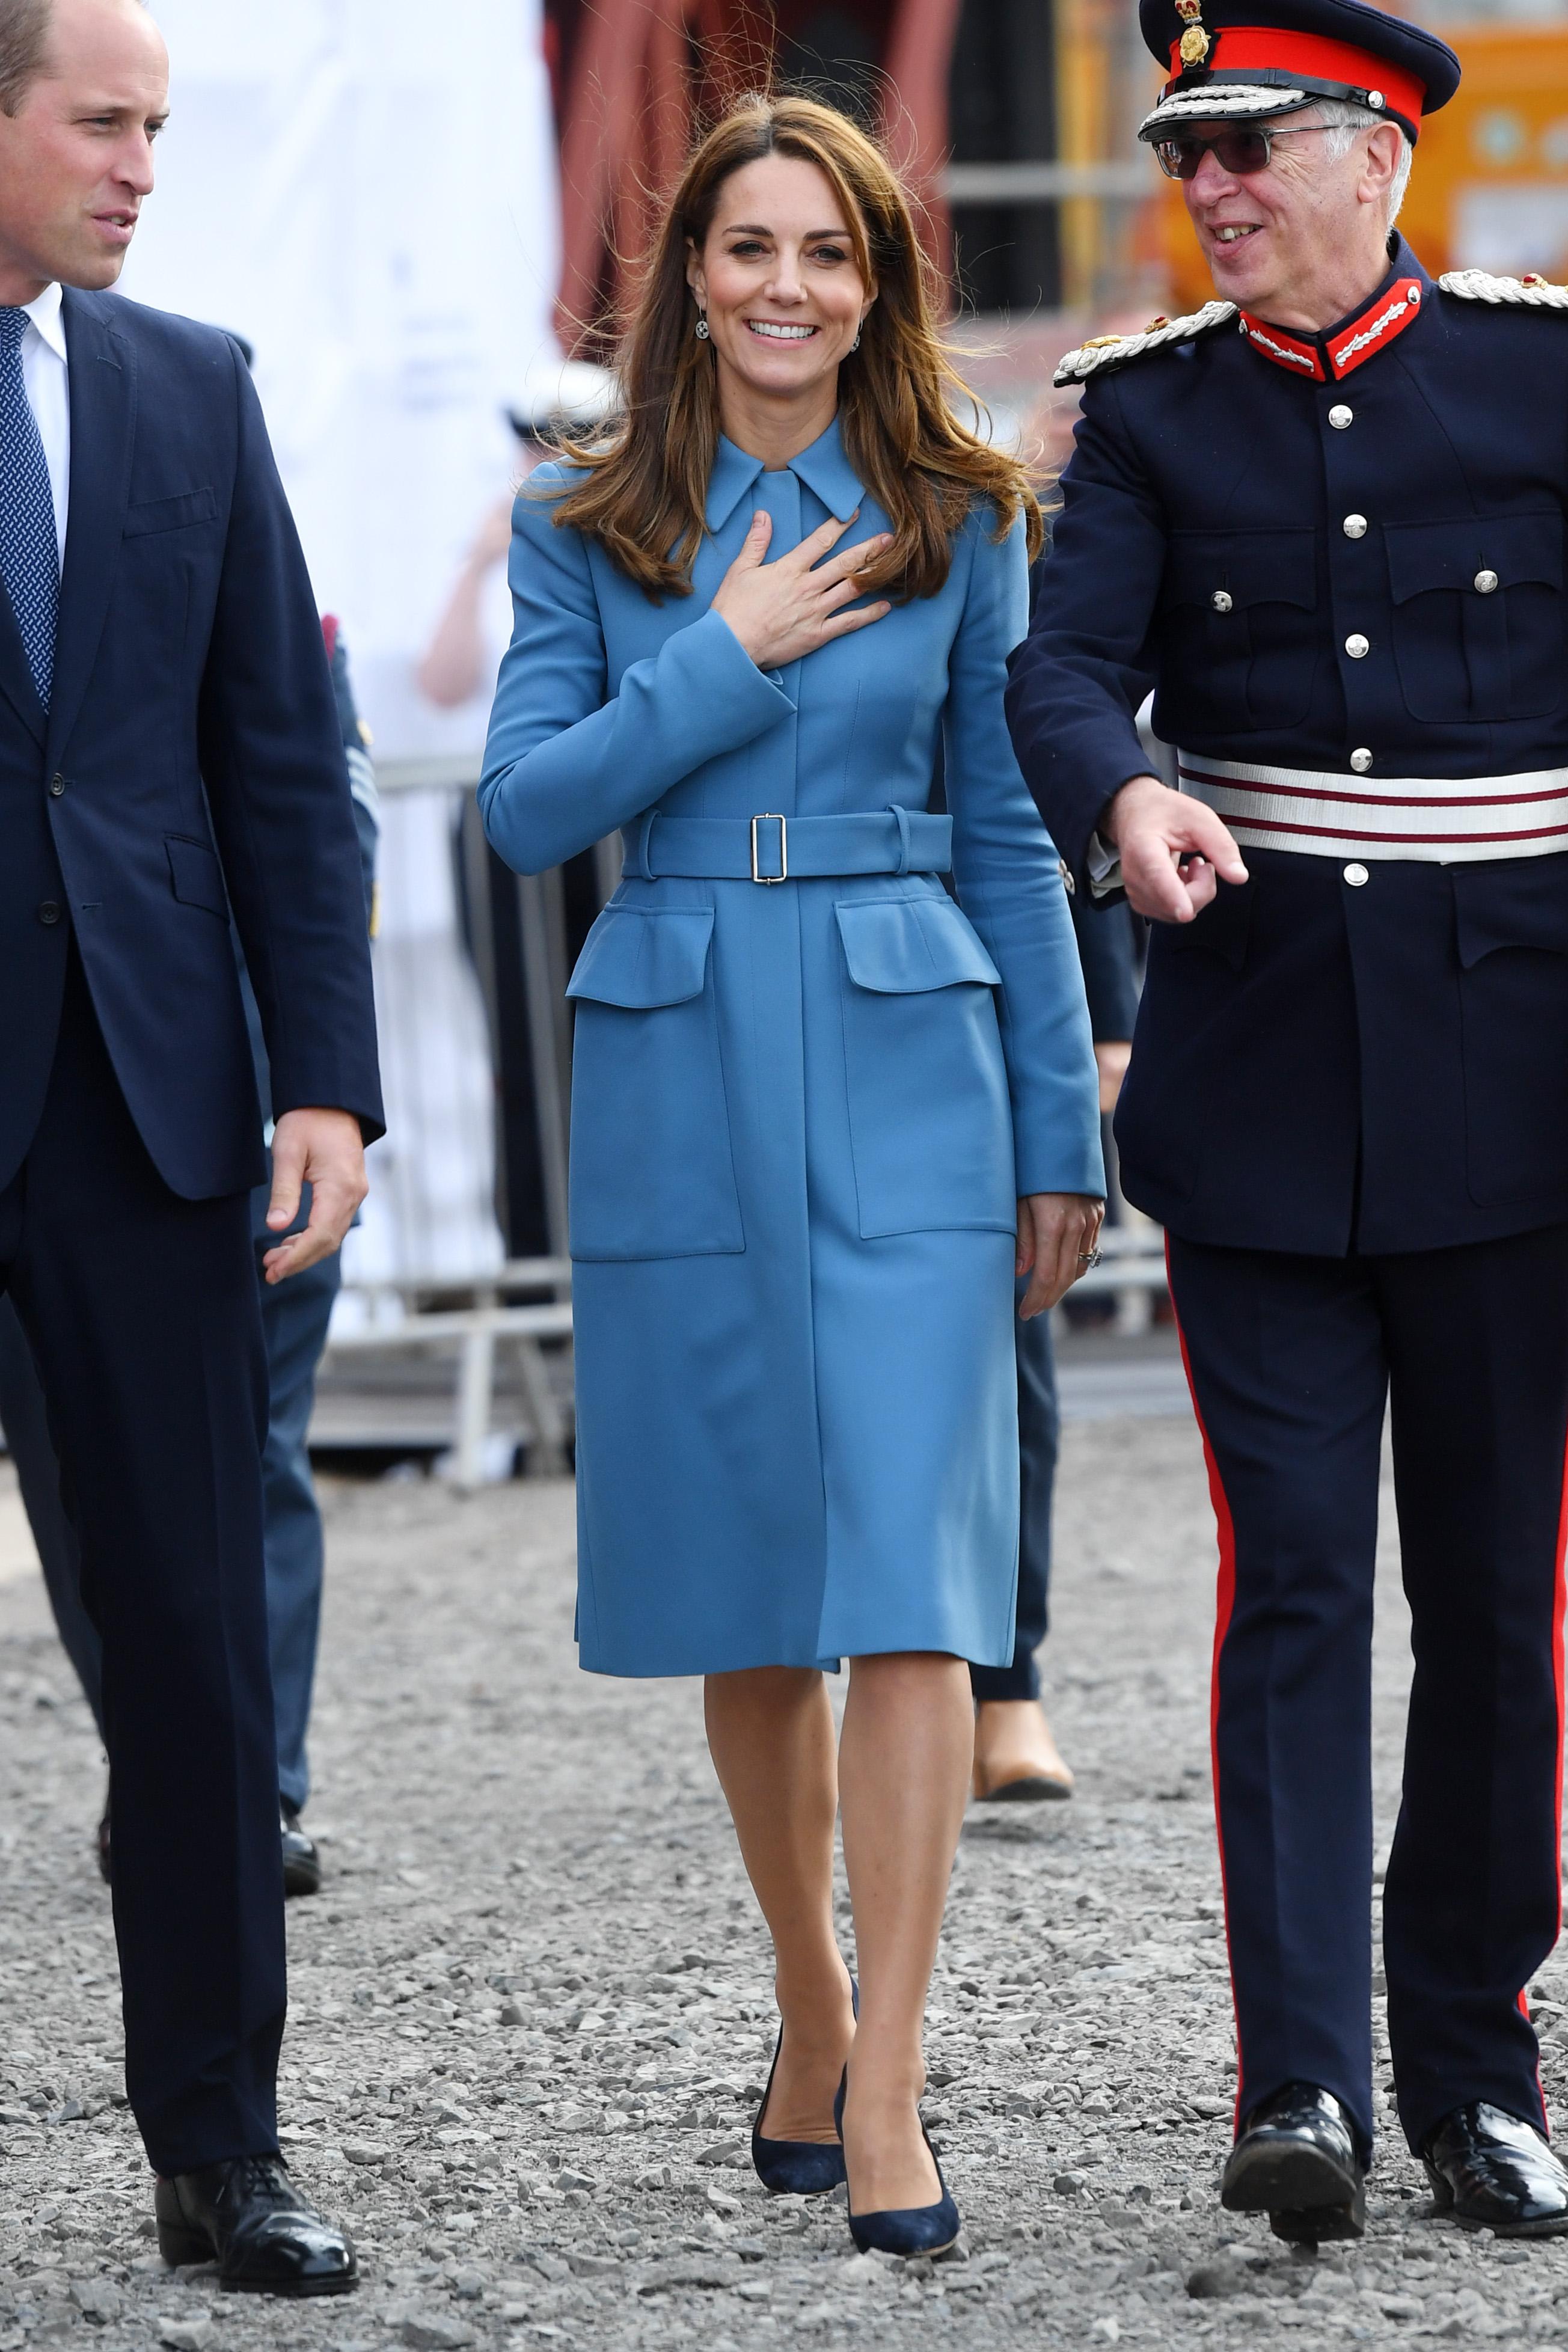 Kate Middleton - now Duchess of Cambridge of the British Royal family